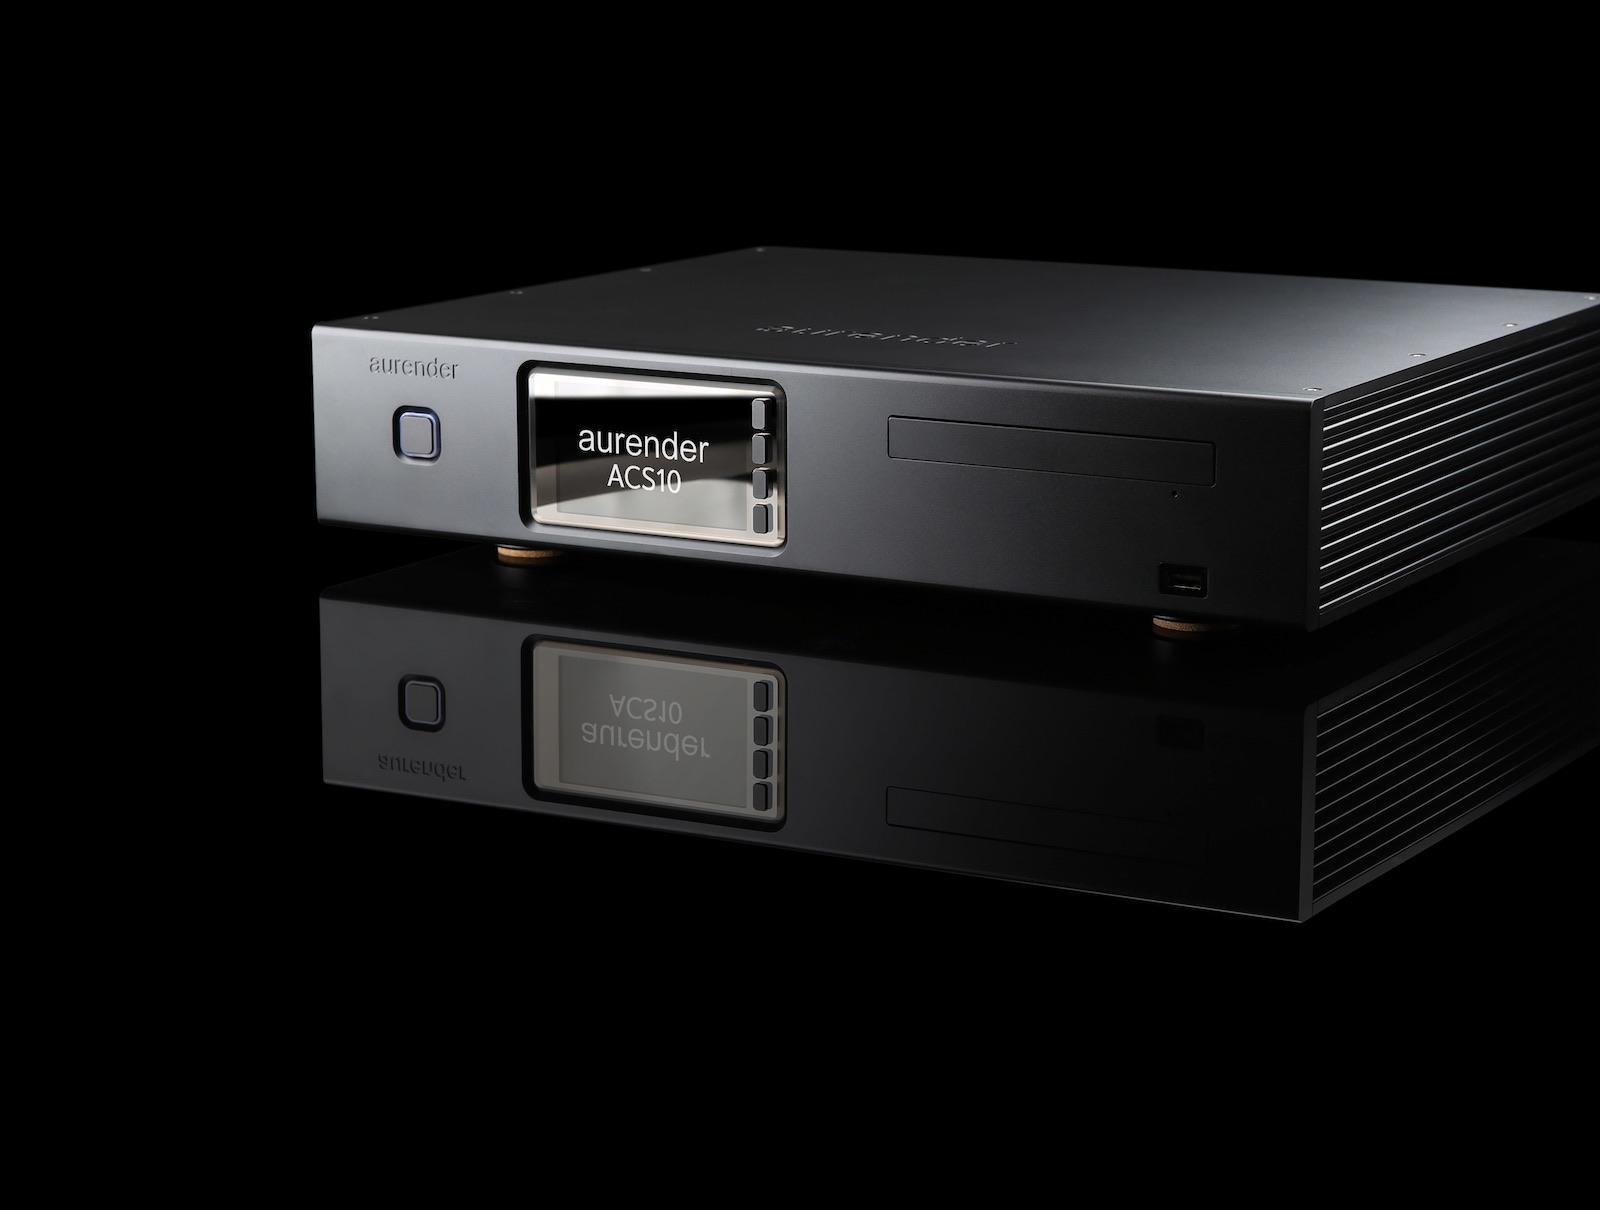 Aurender Content Server ACS10 Full Review